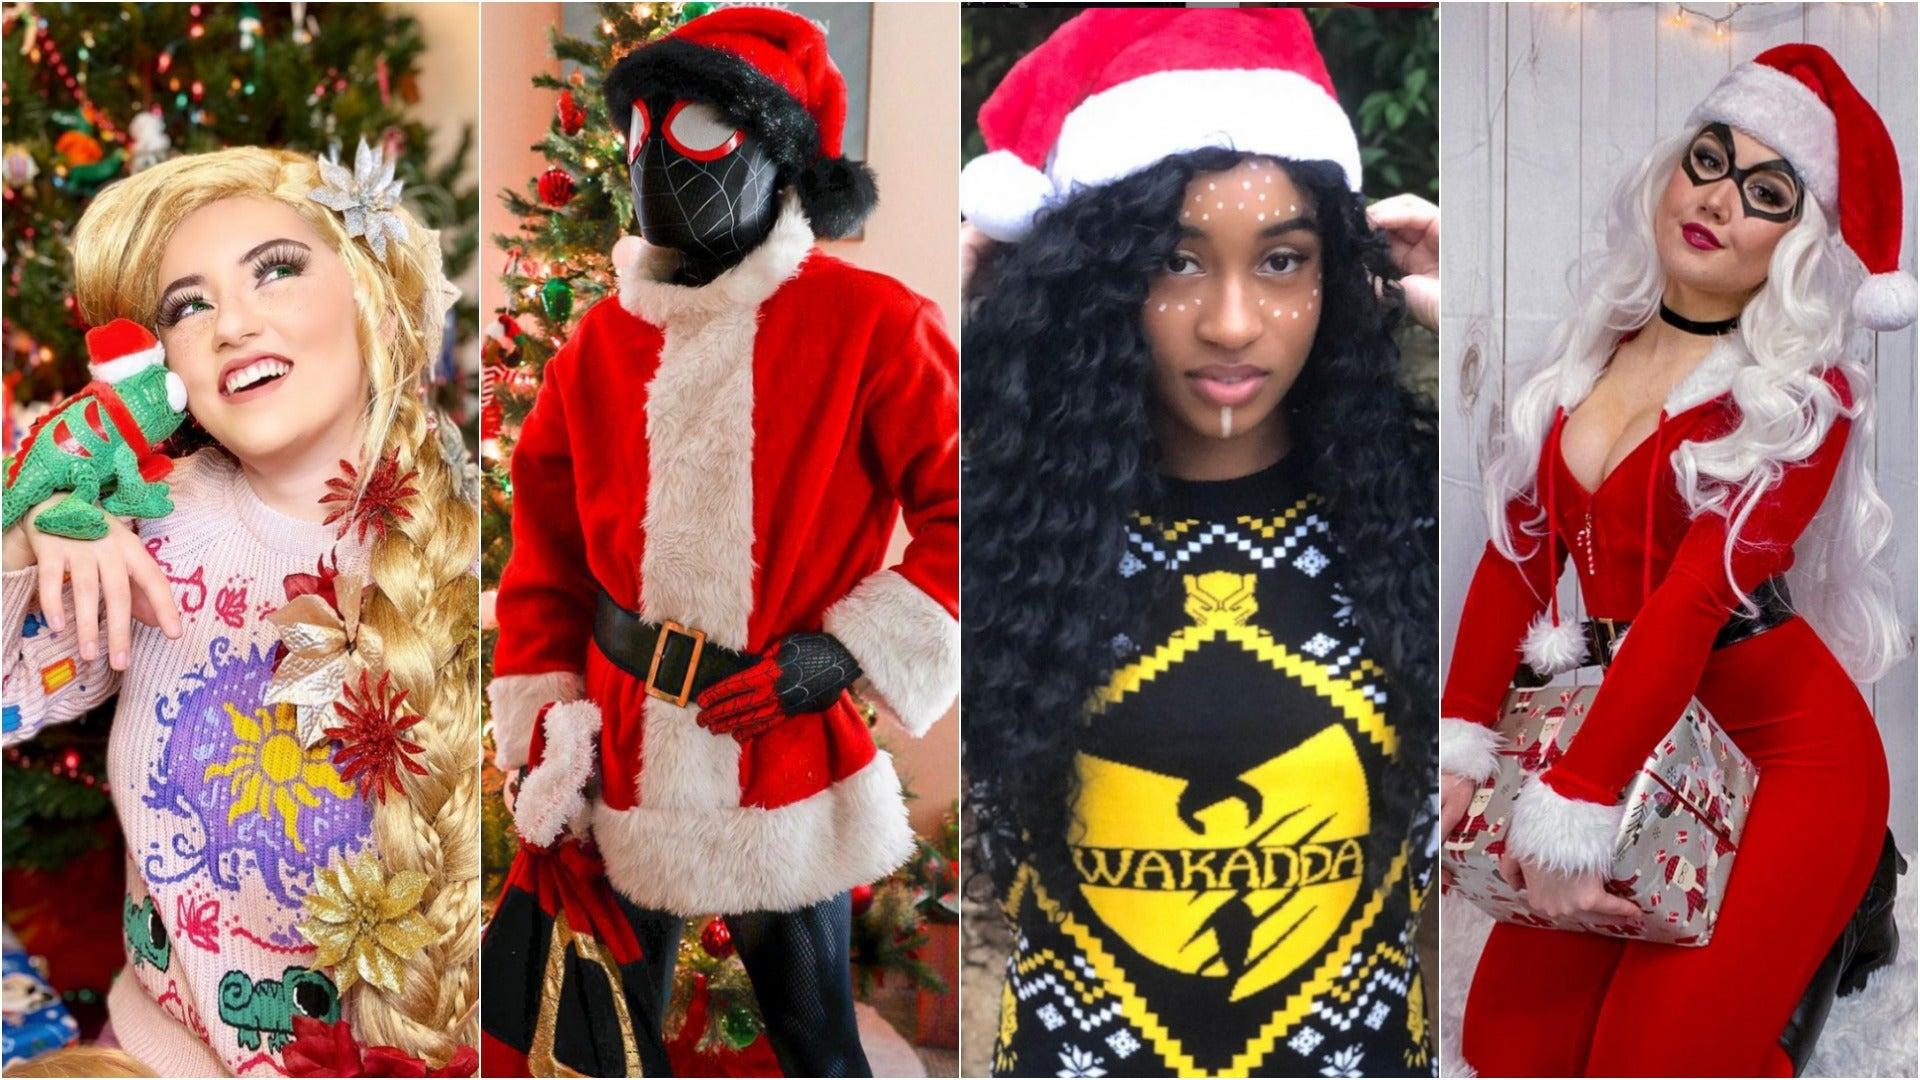 Rapunzel Cosplay, Spider-Man Cosplay, Black Panther Cosplay, Black Cat Cosplay